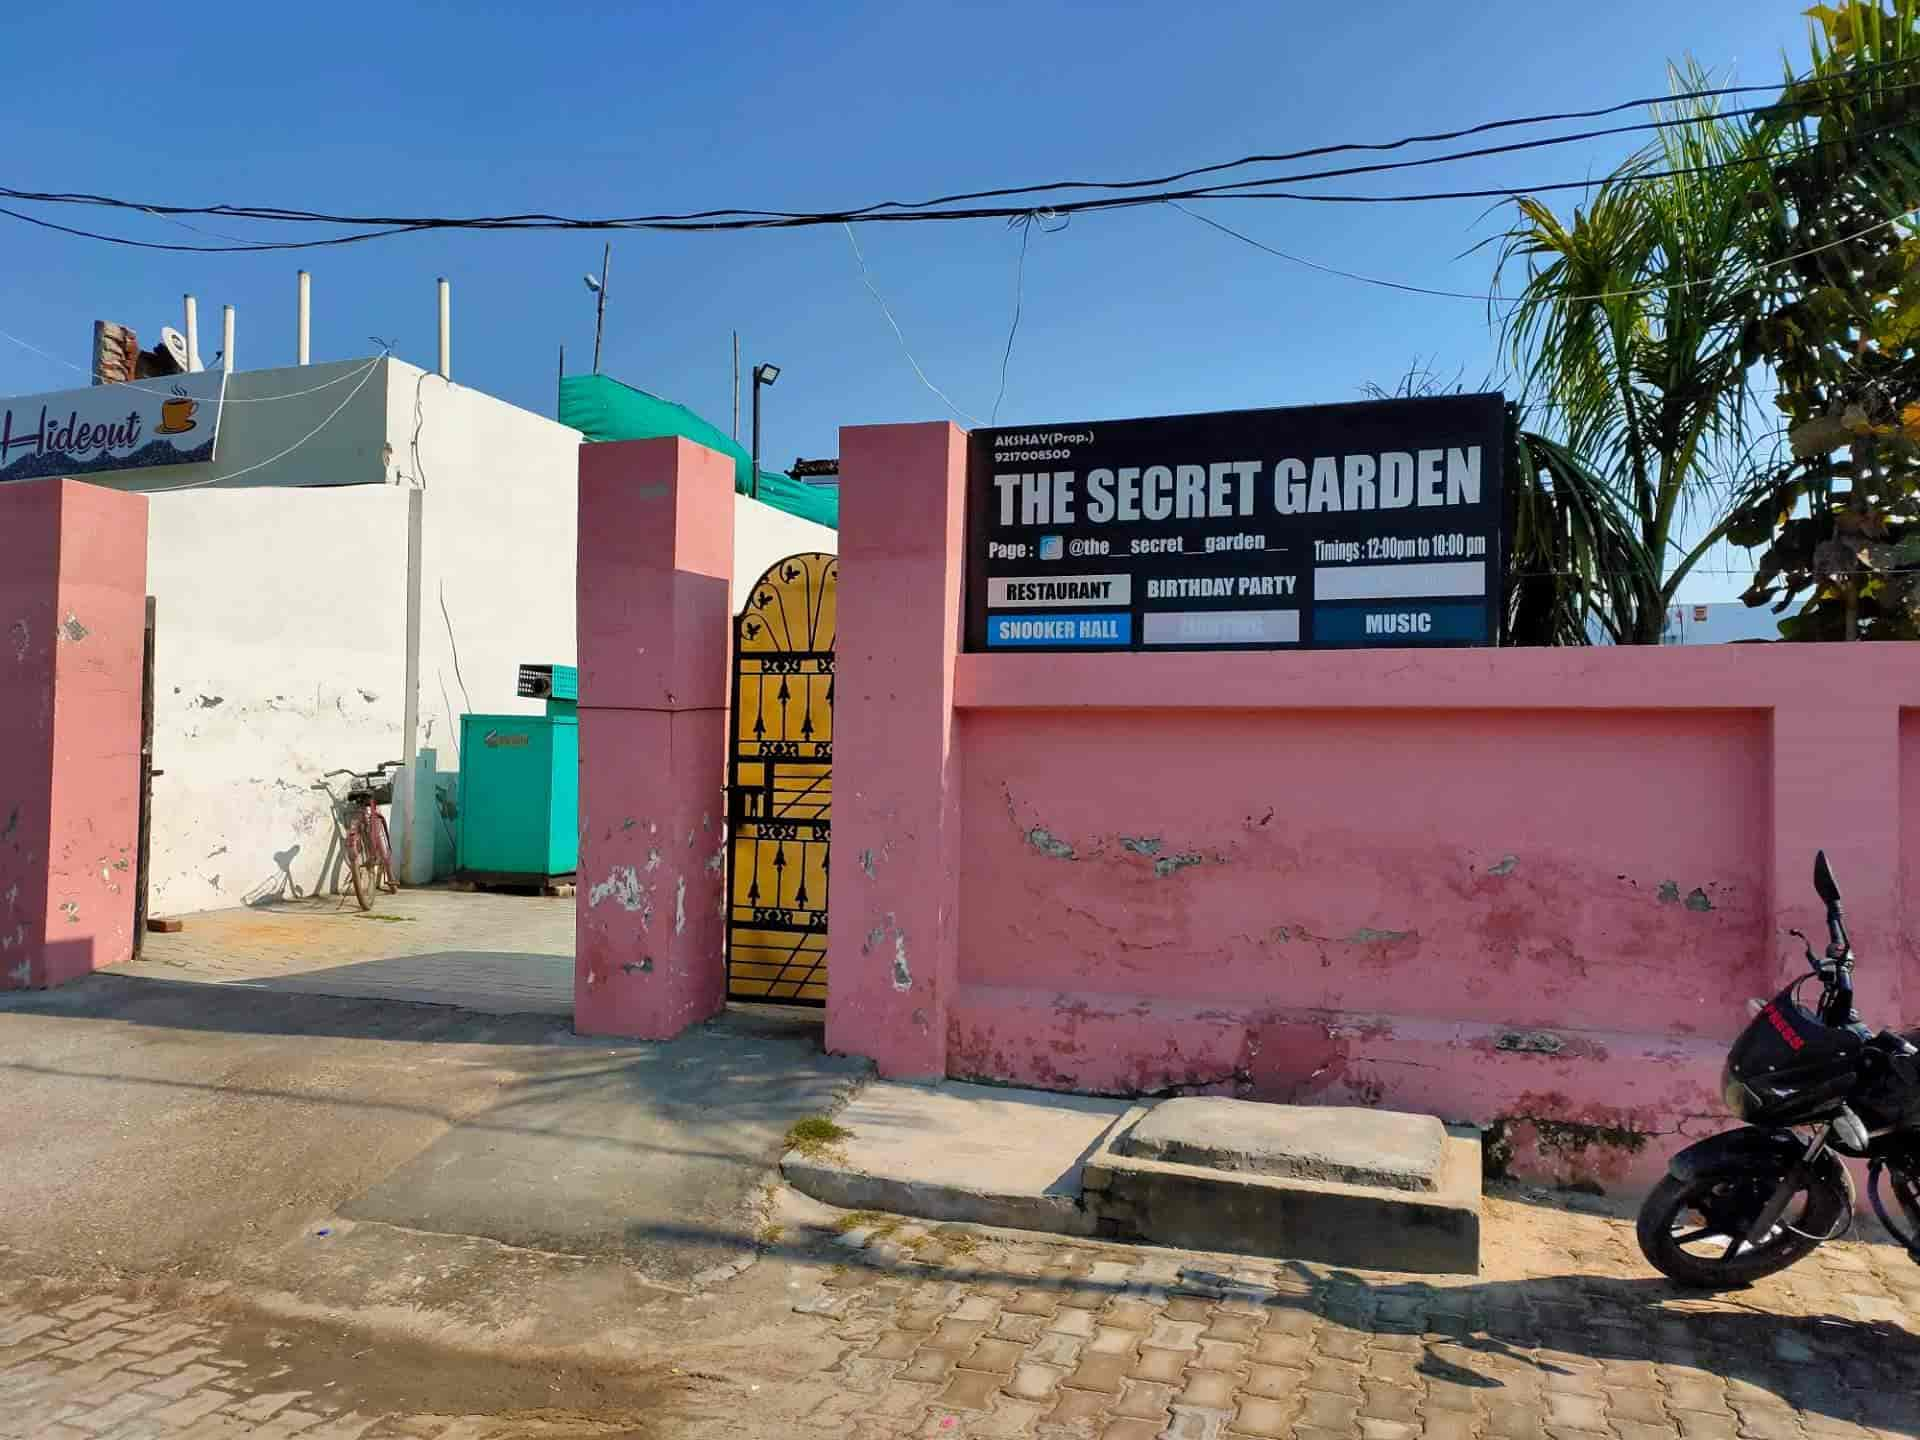 The Secret Garden Sidhuwal Patiala Indian Cuisine Restaurant Justdial